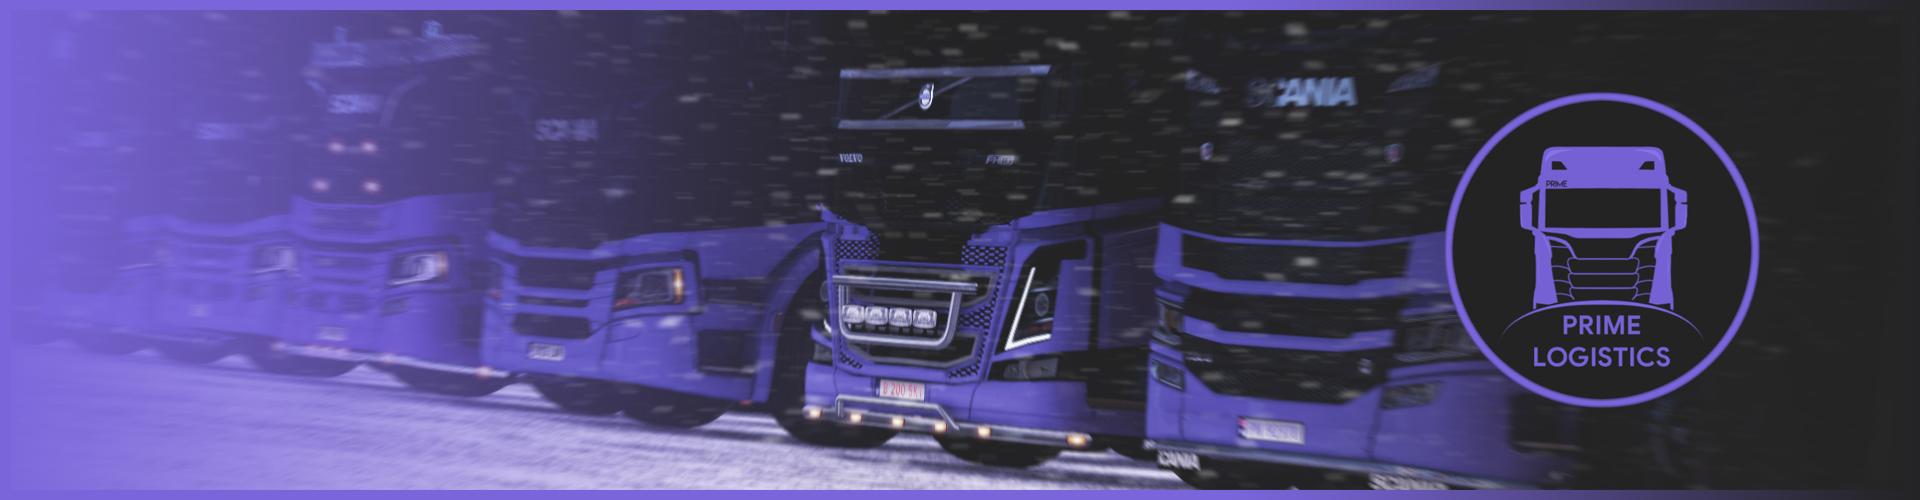 🟣 Prime Logistics Convoy #93